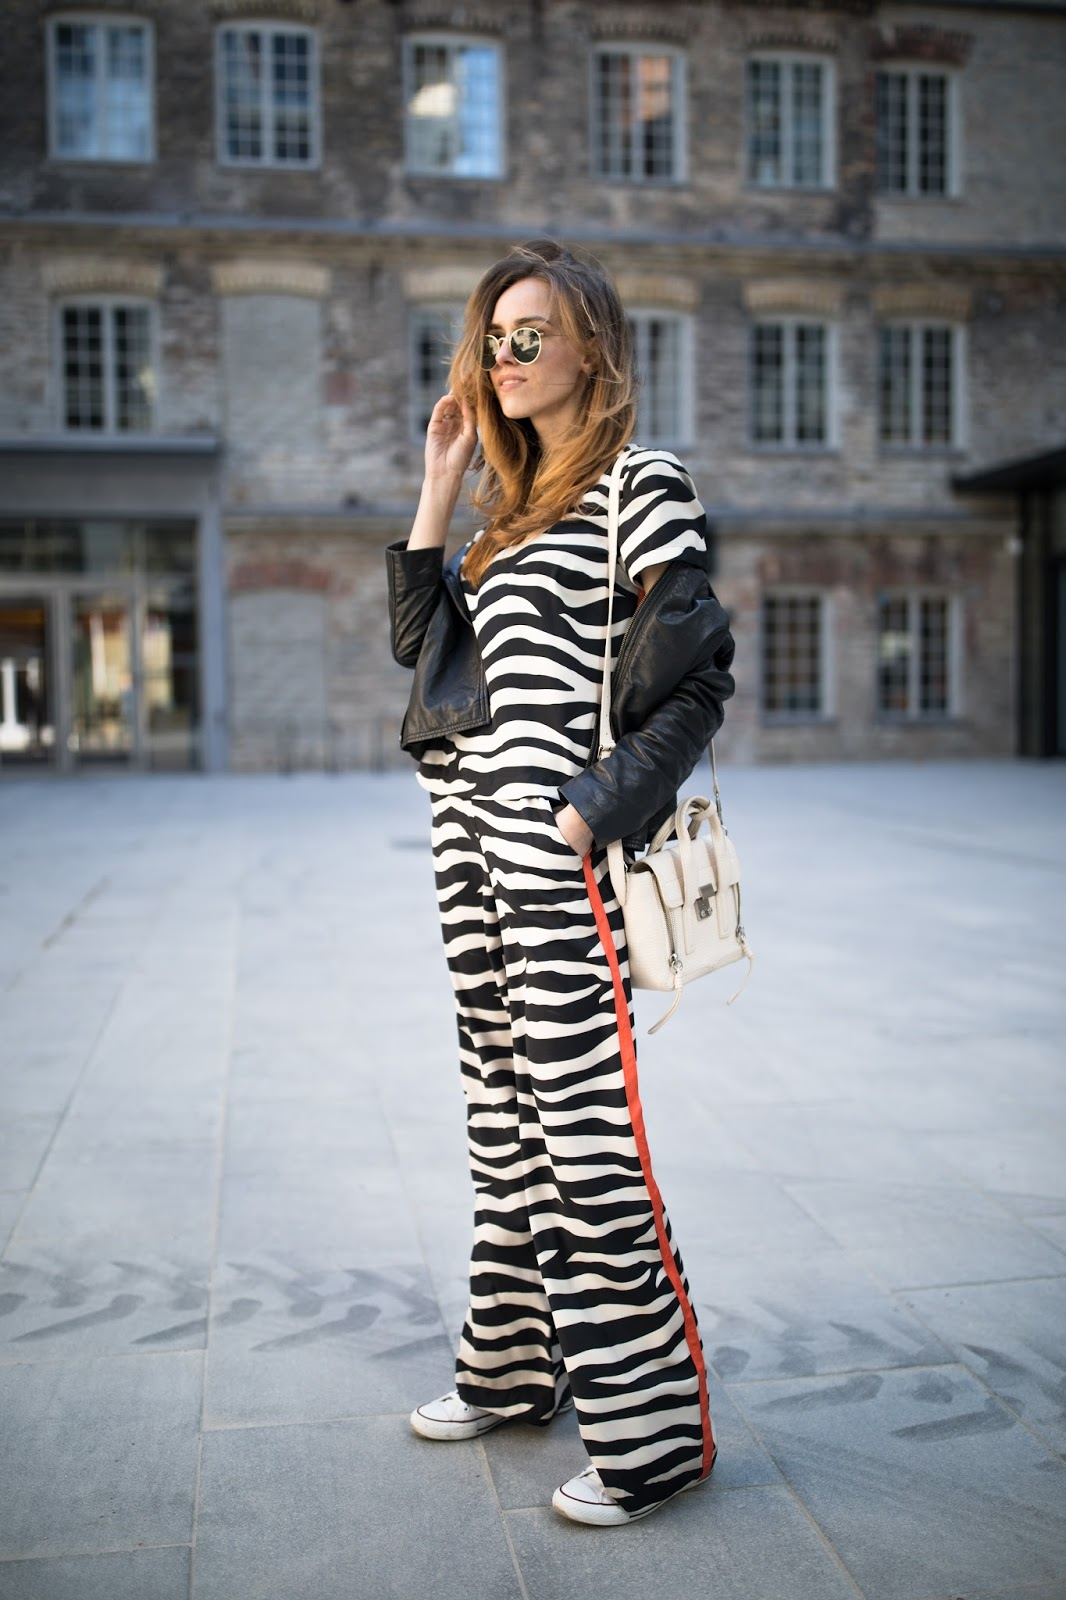 pyjama trend outfit